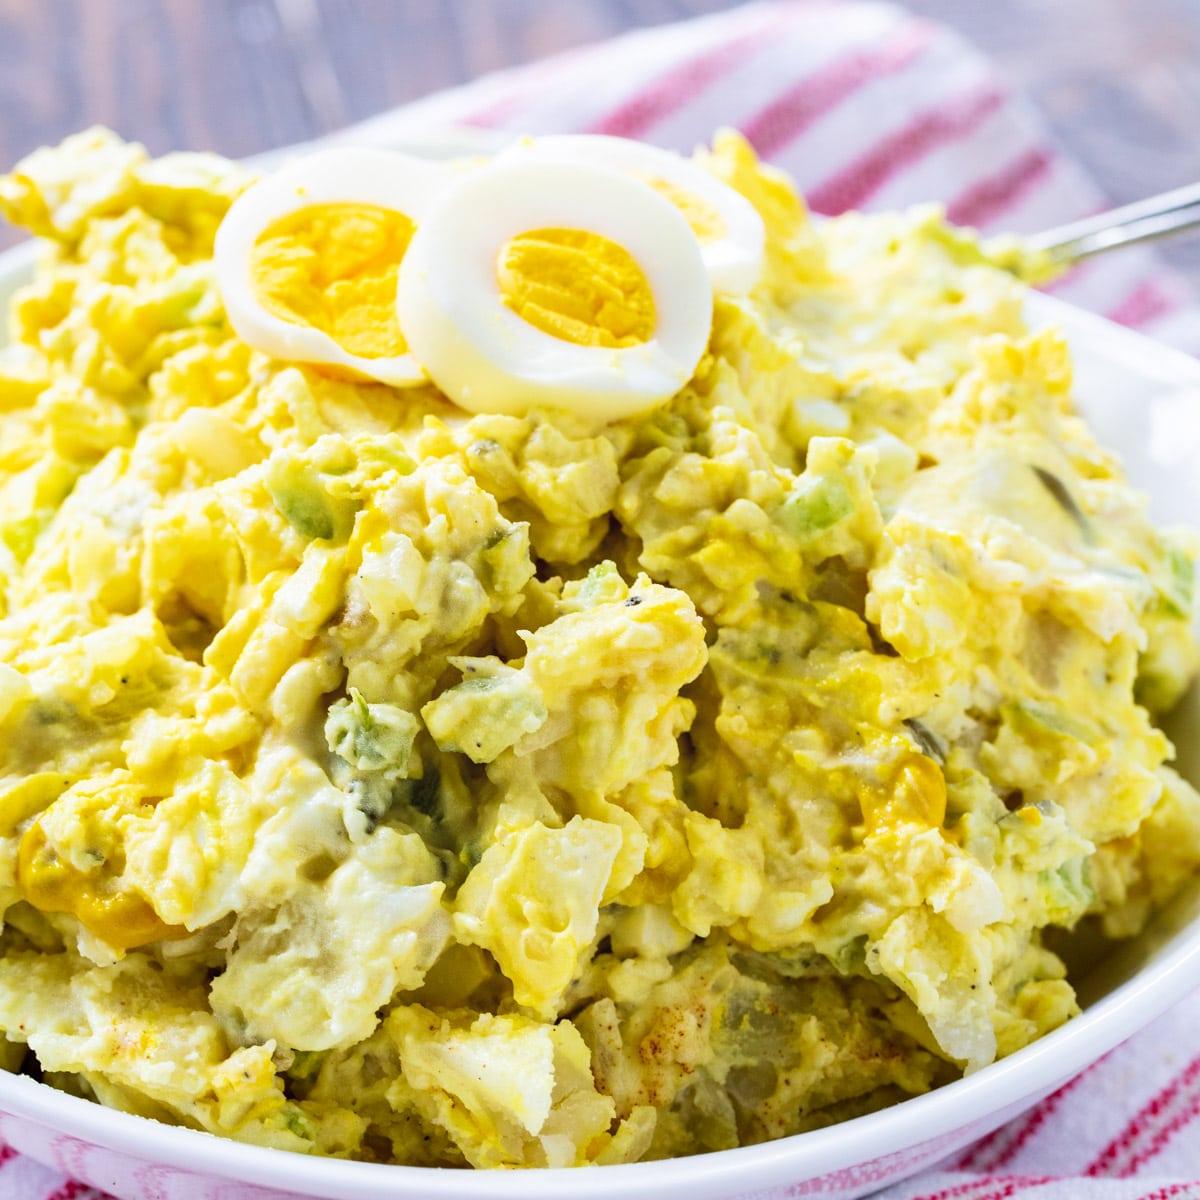 Southern Mustard Potato Salad in large white serving bowl.